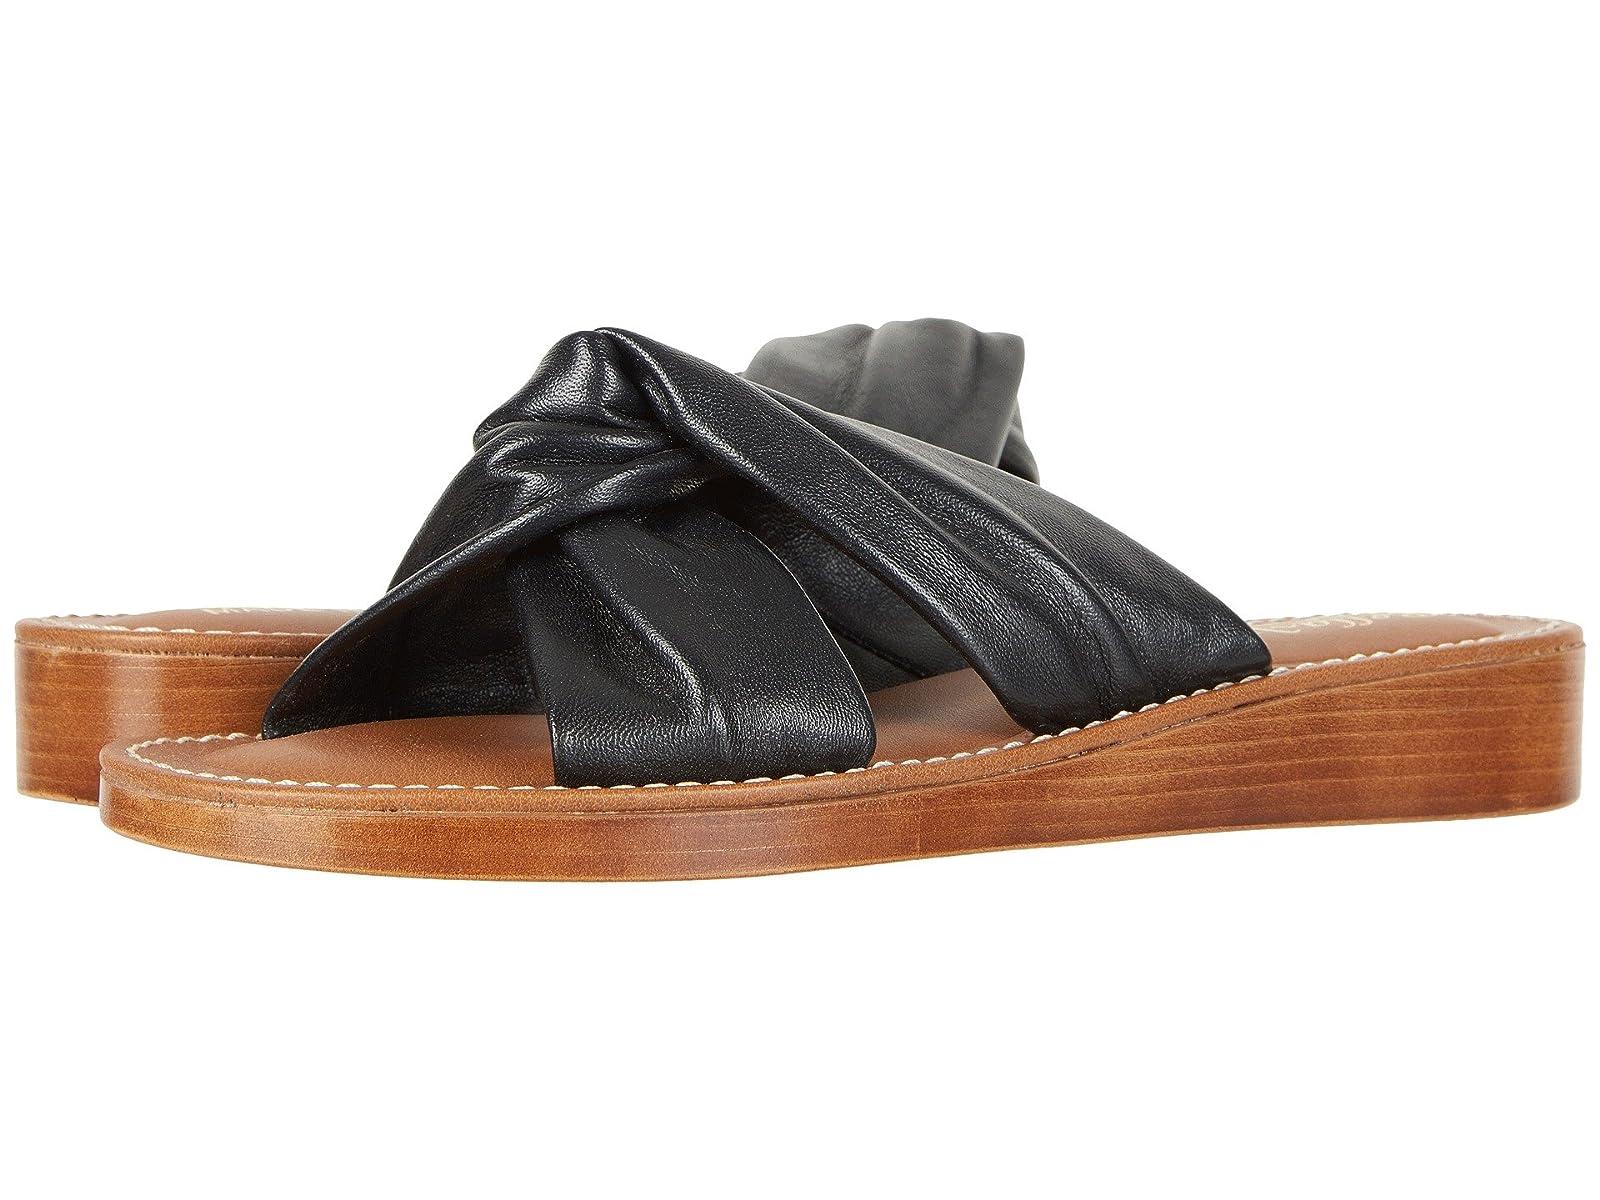 Bella-Vita Noa-ItalyComfortable and distinctive shoes